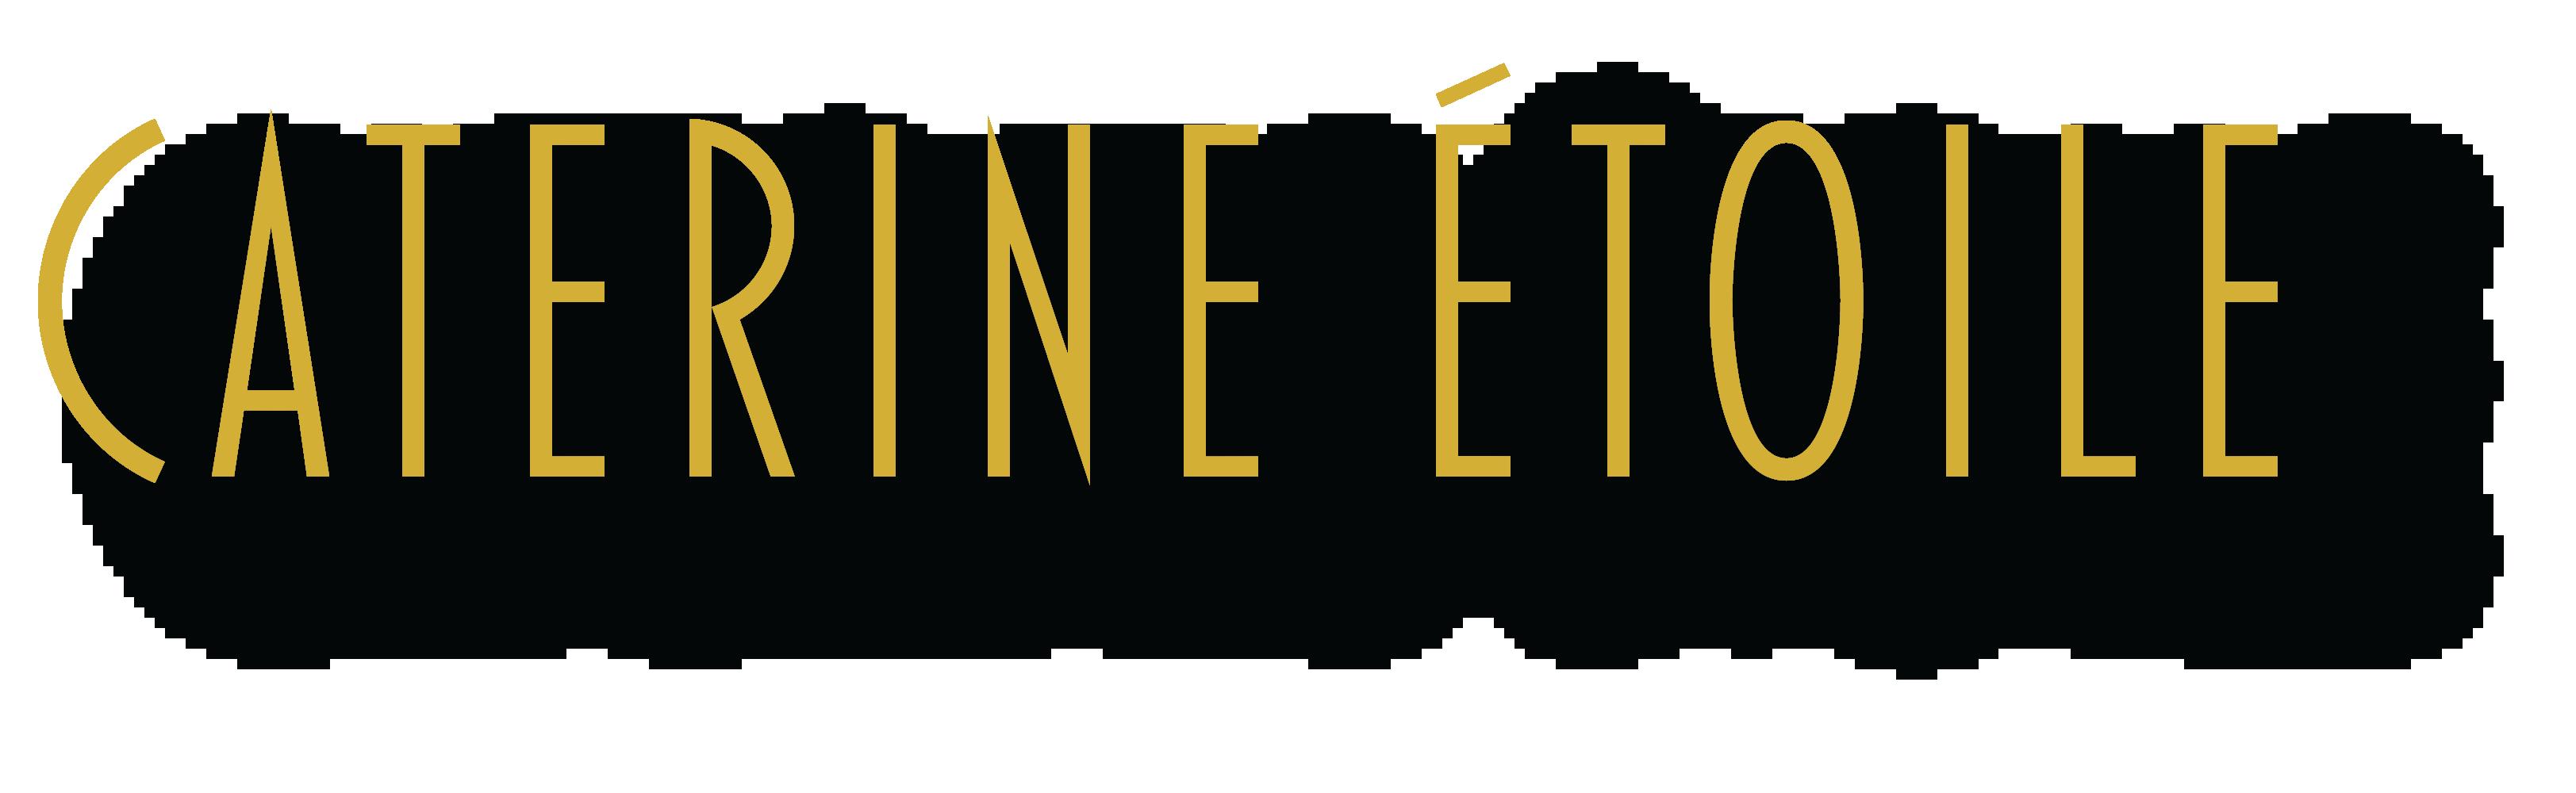 Caterine Étoile